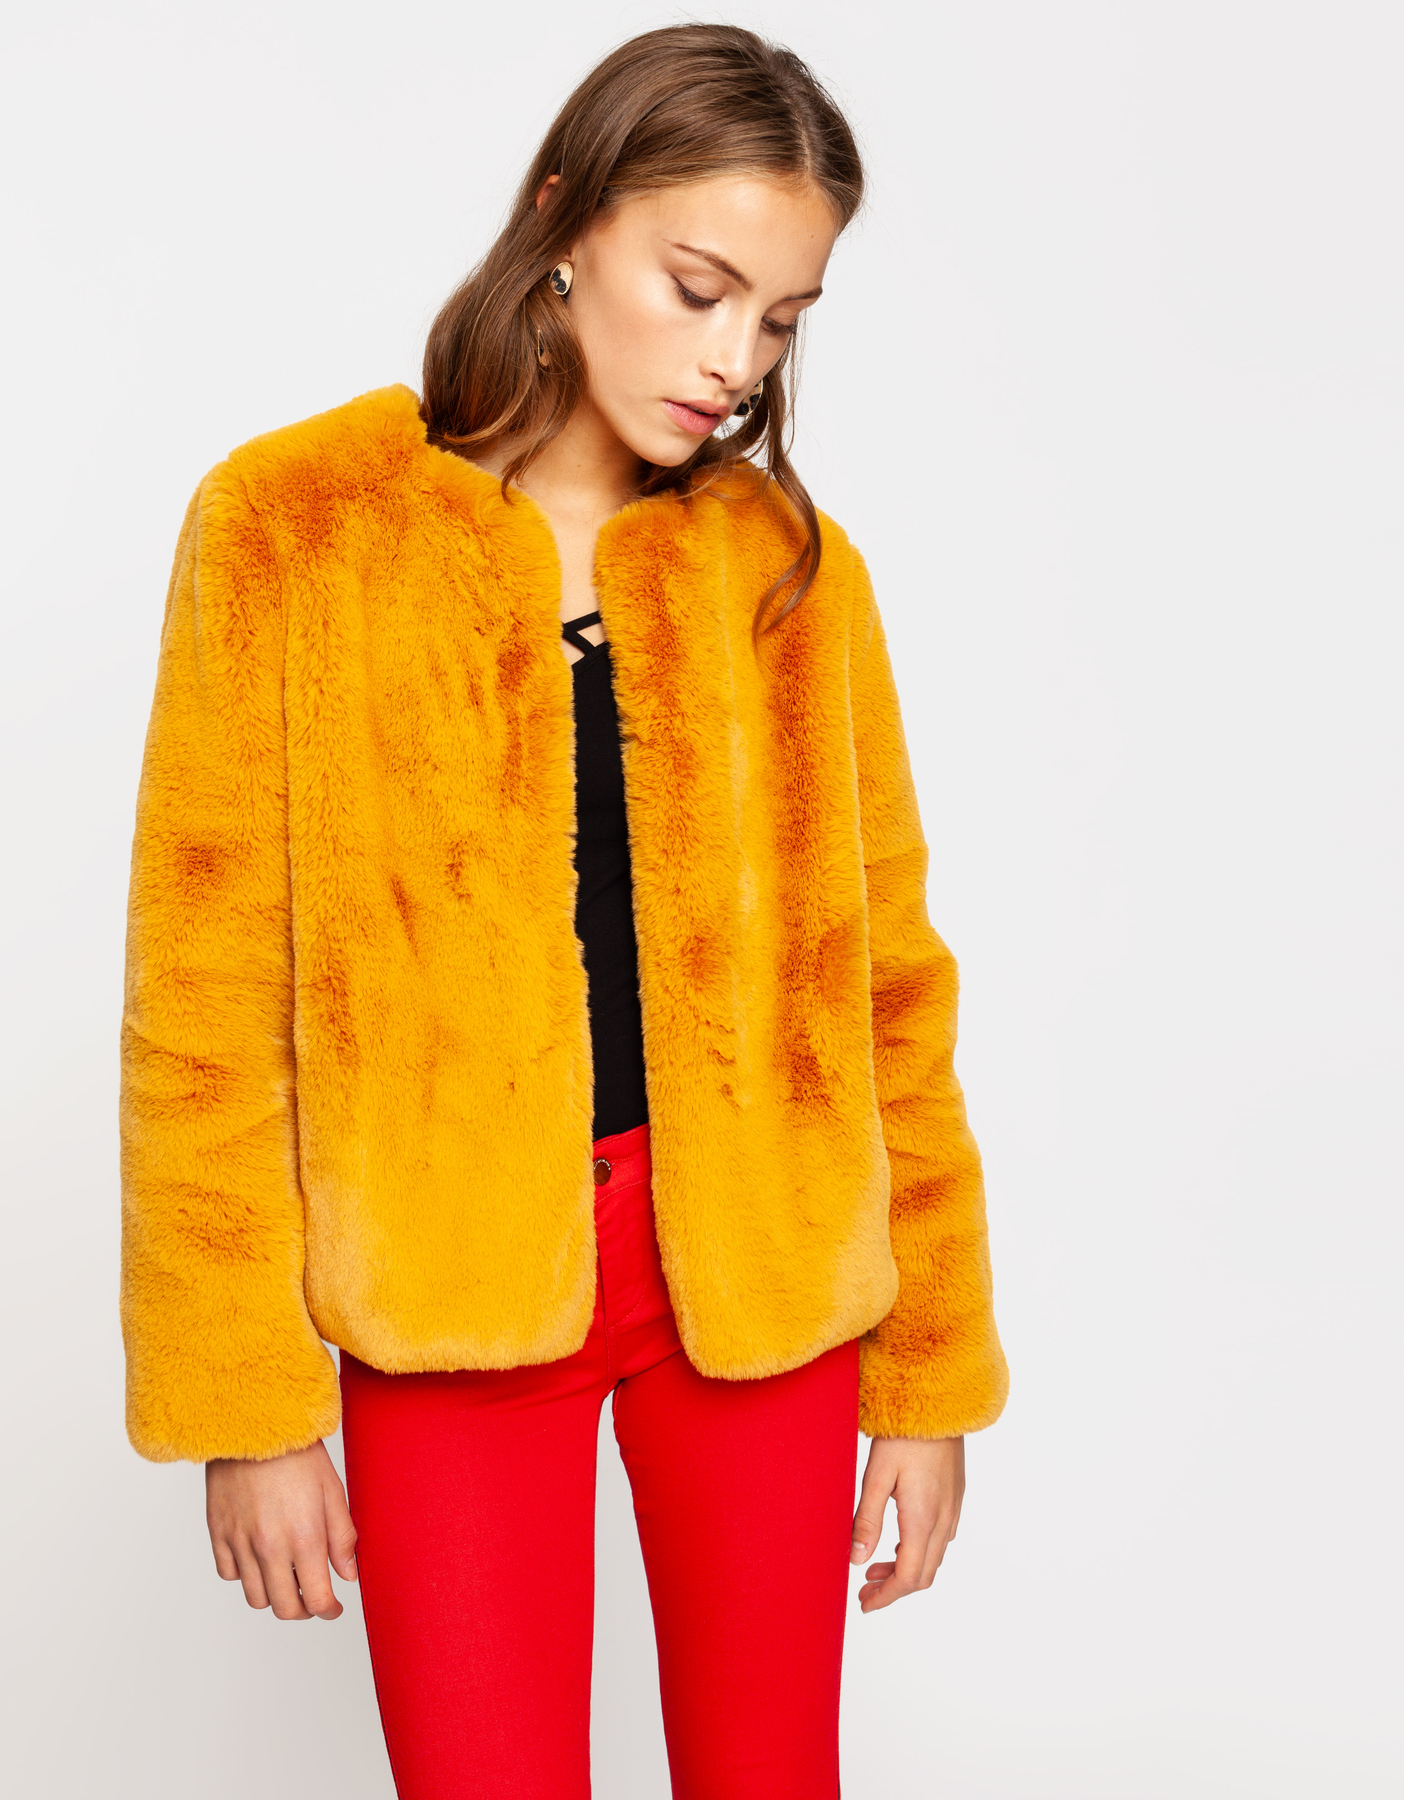 Gelbe flauschige Jacke